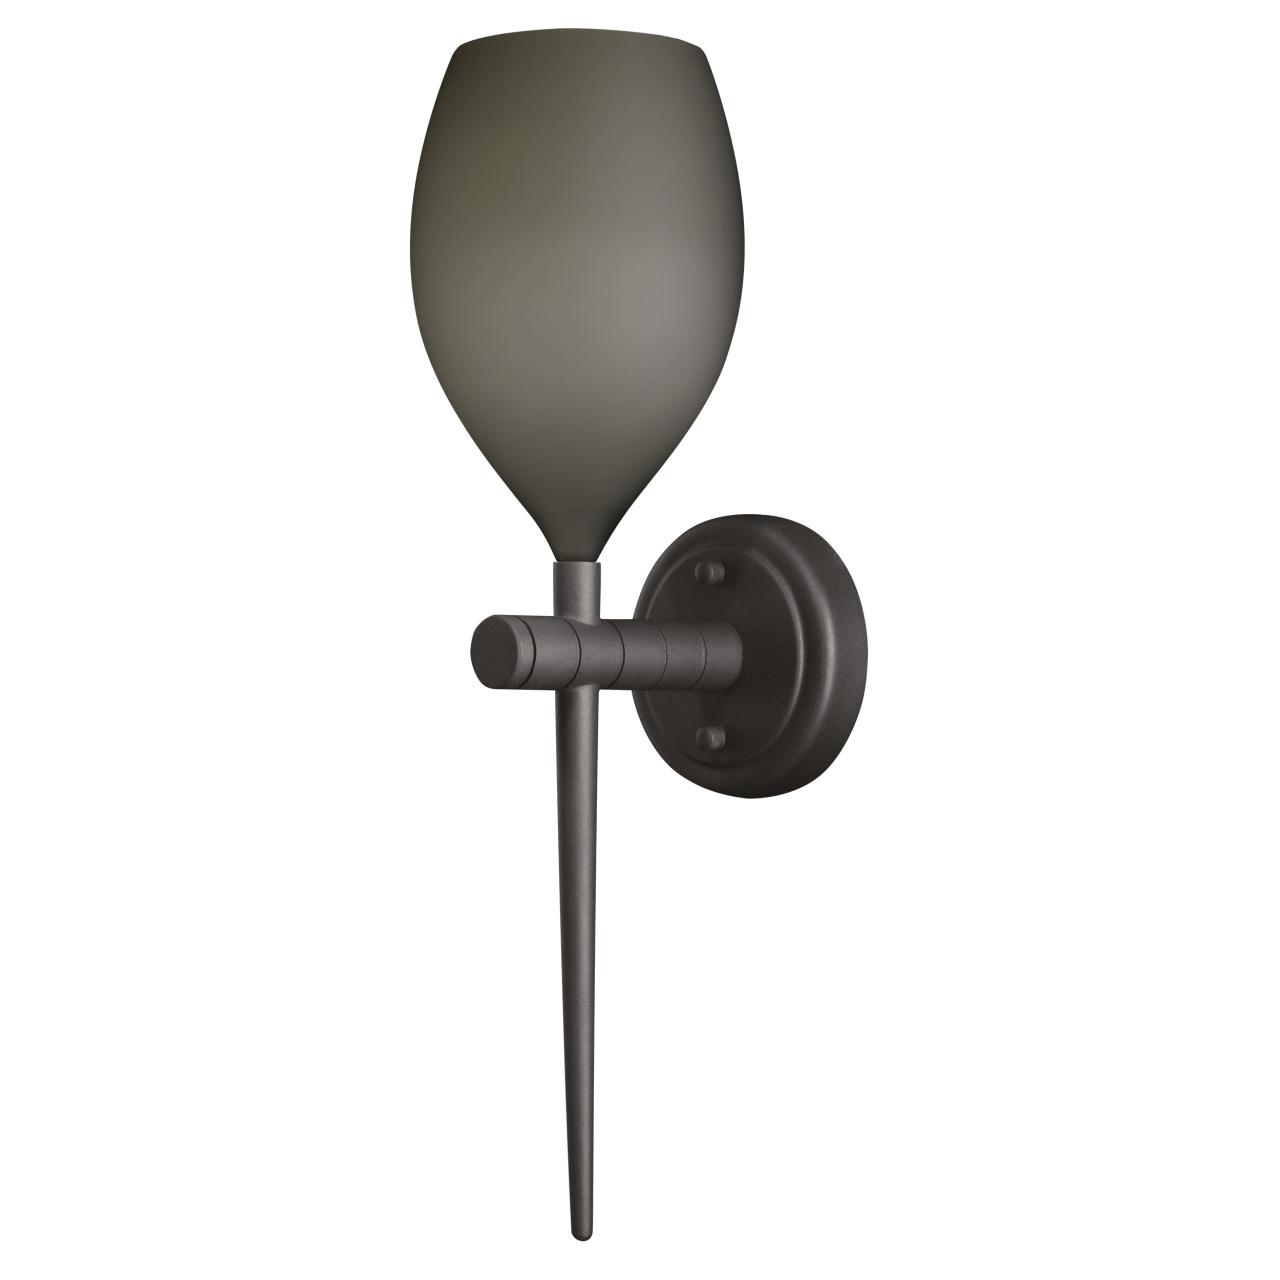 Бра Meta D'Uovo 1х40W E14 серый матовый / черный хром Lightstar 807611